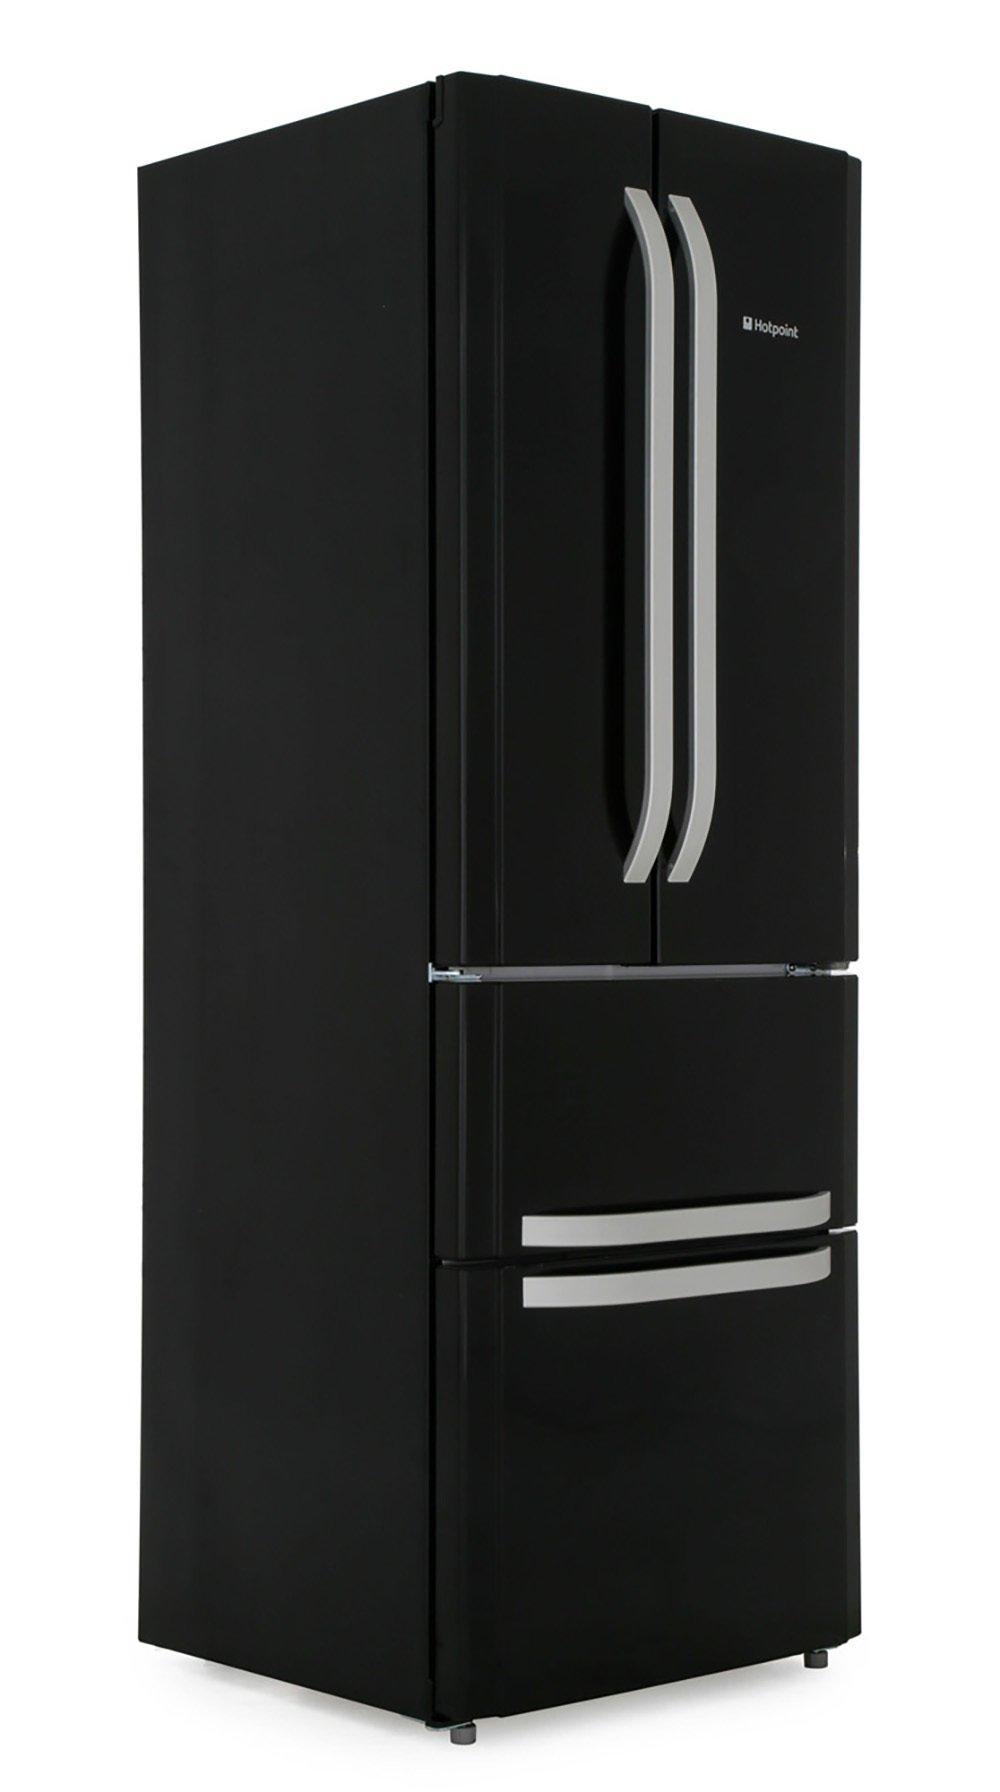 Hotpoint FFU4D.1K American Fridge Freezer